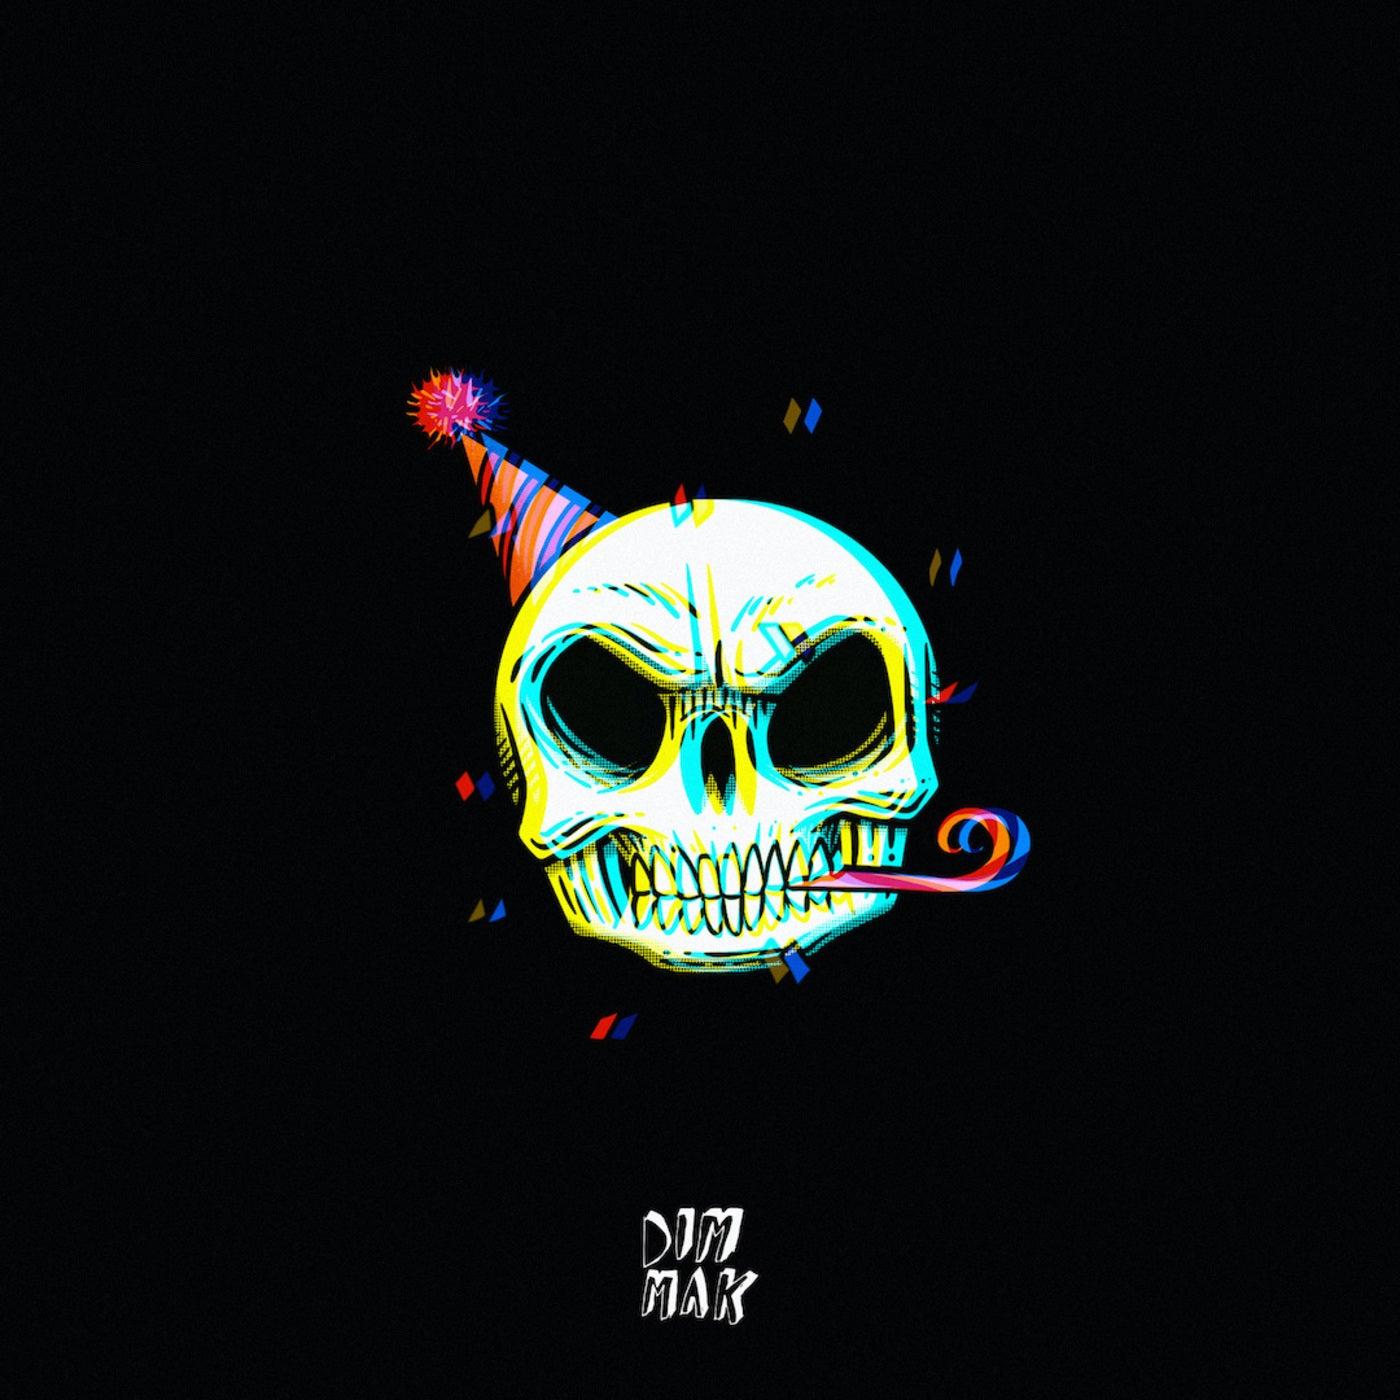 Poppin (feat. Krystall Poppin) (Original Mix)